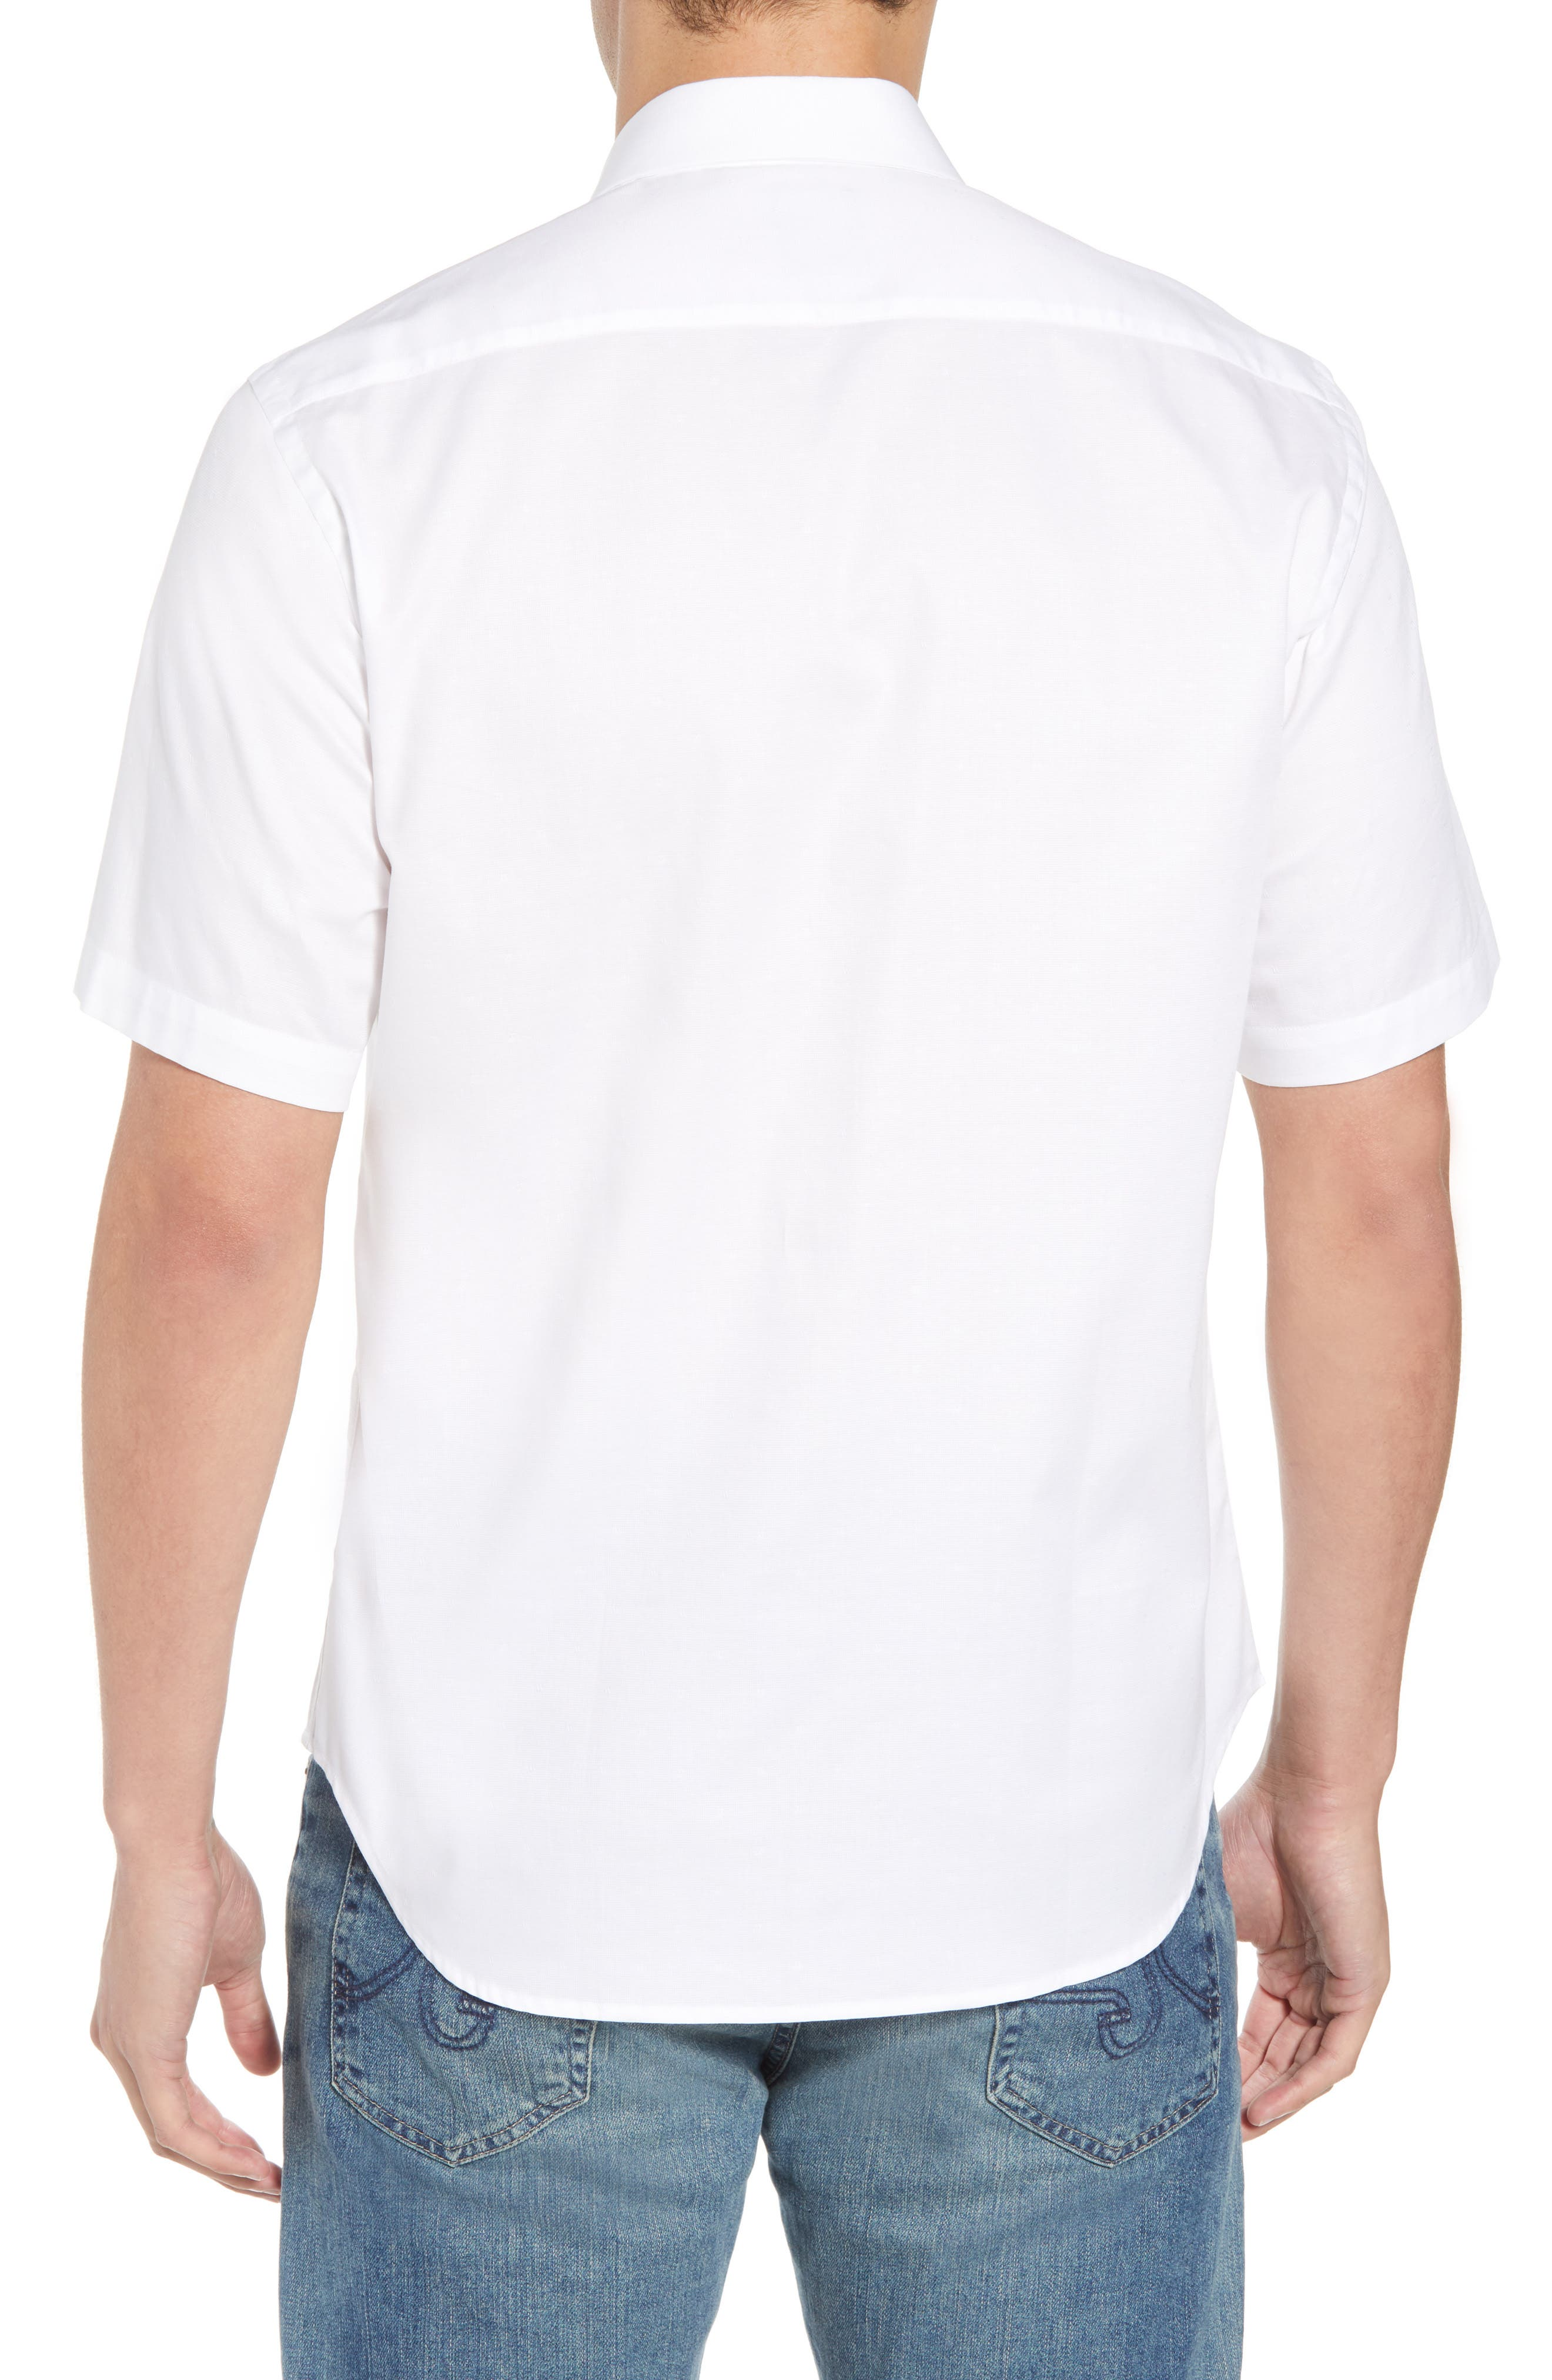 Arlen Regular Fit Sport Shirt,                             Alternate thumbnail 2, color,                             100